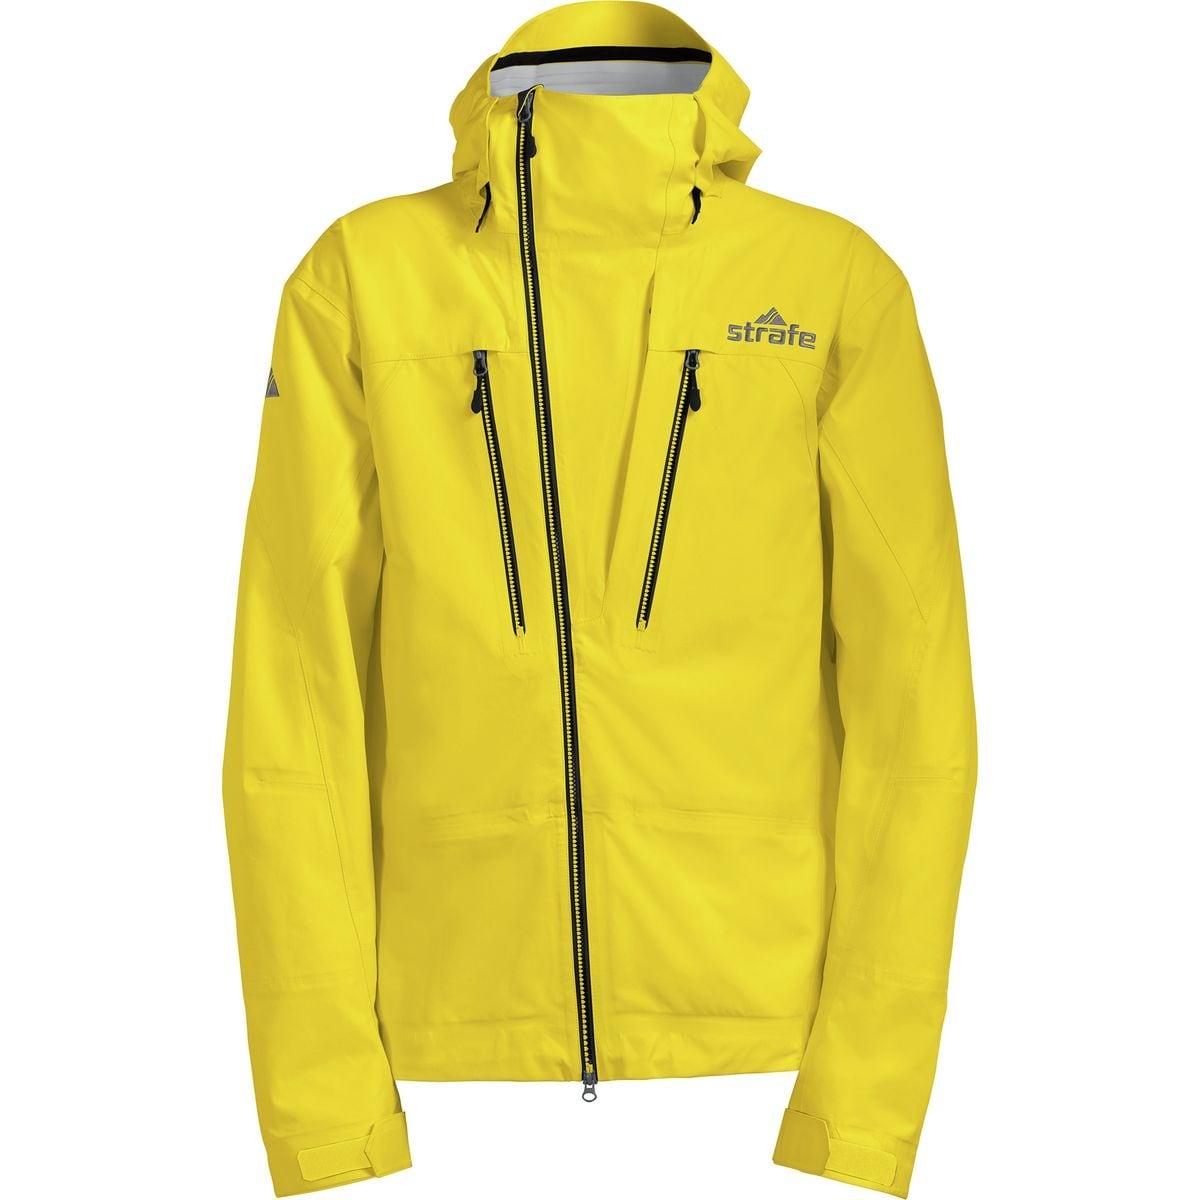 Strafe Outerwear Temerity Jacket - Men